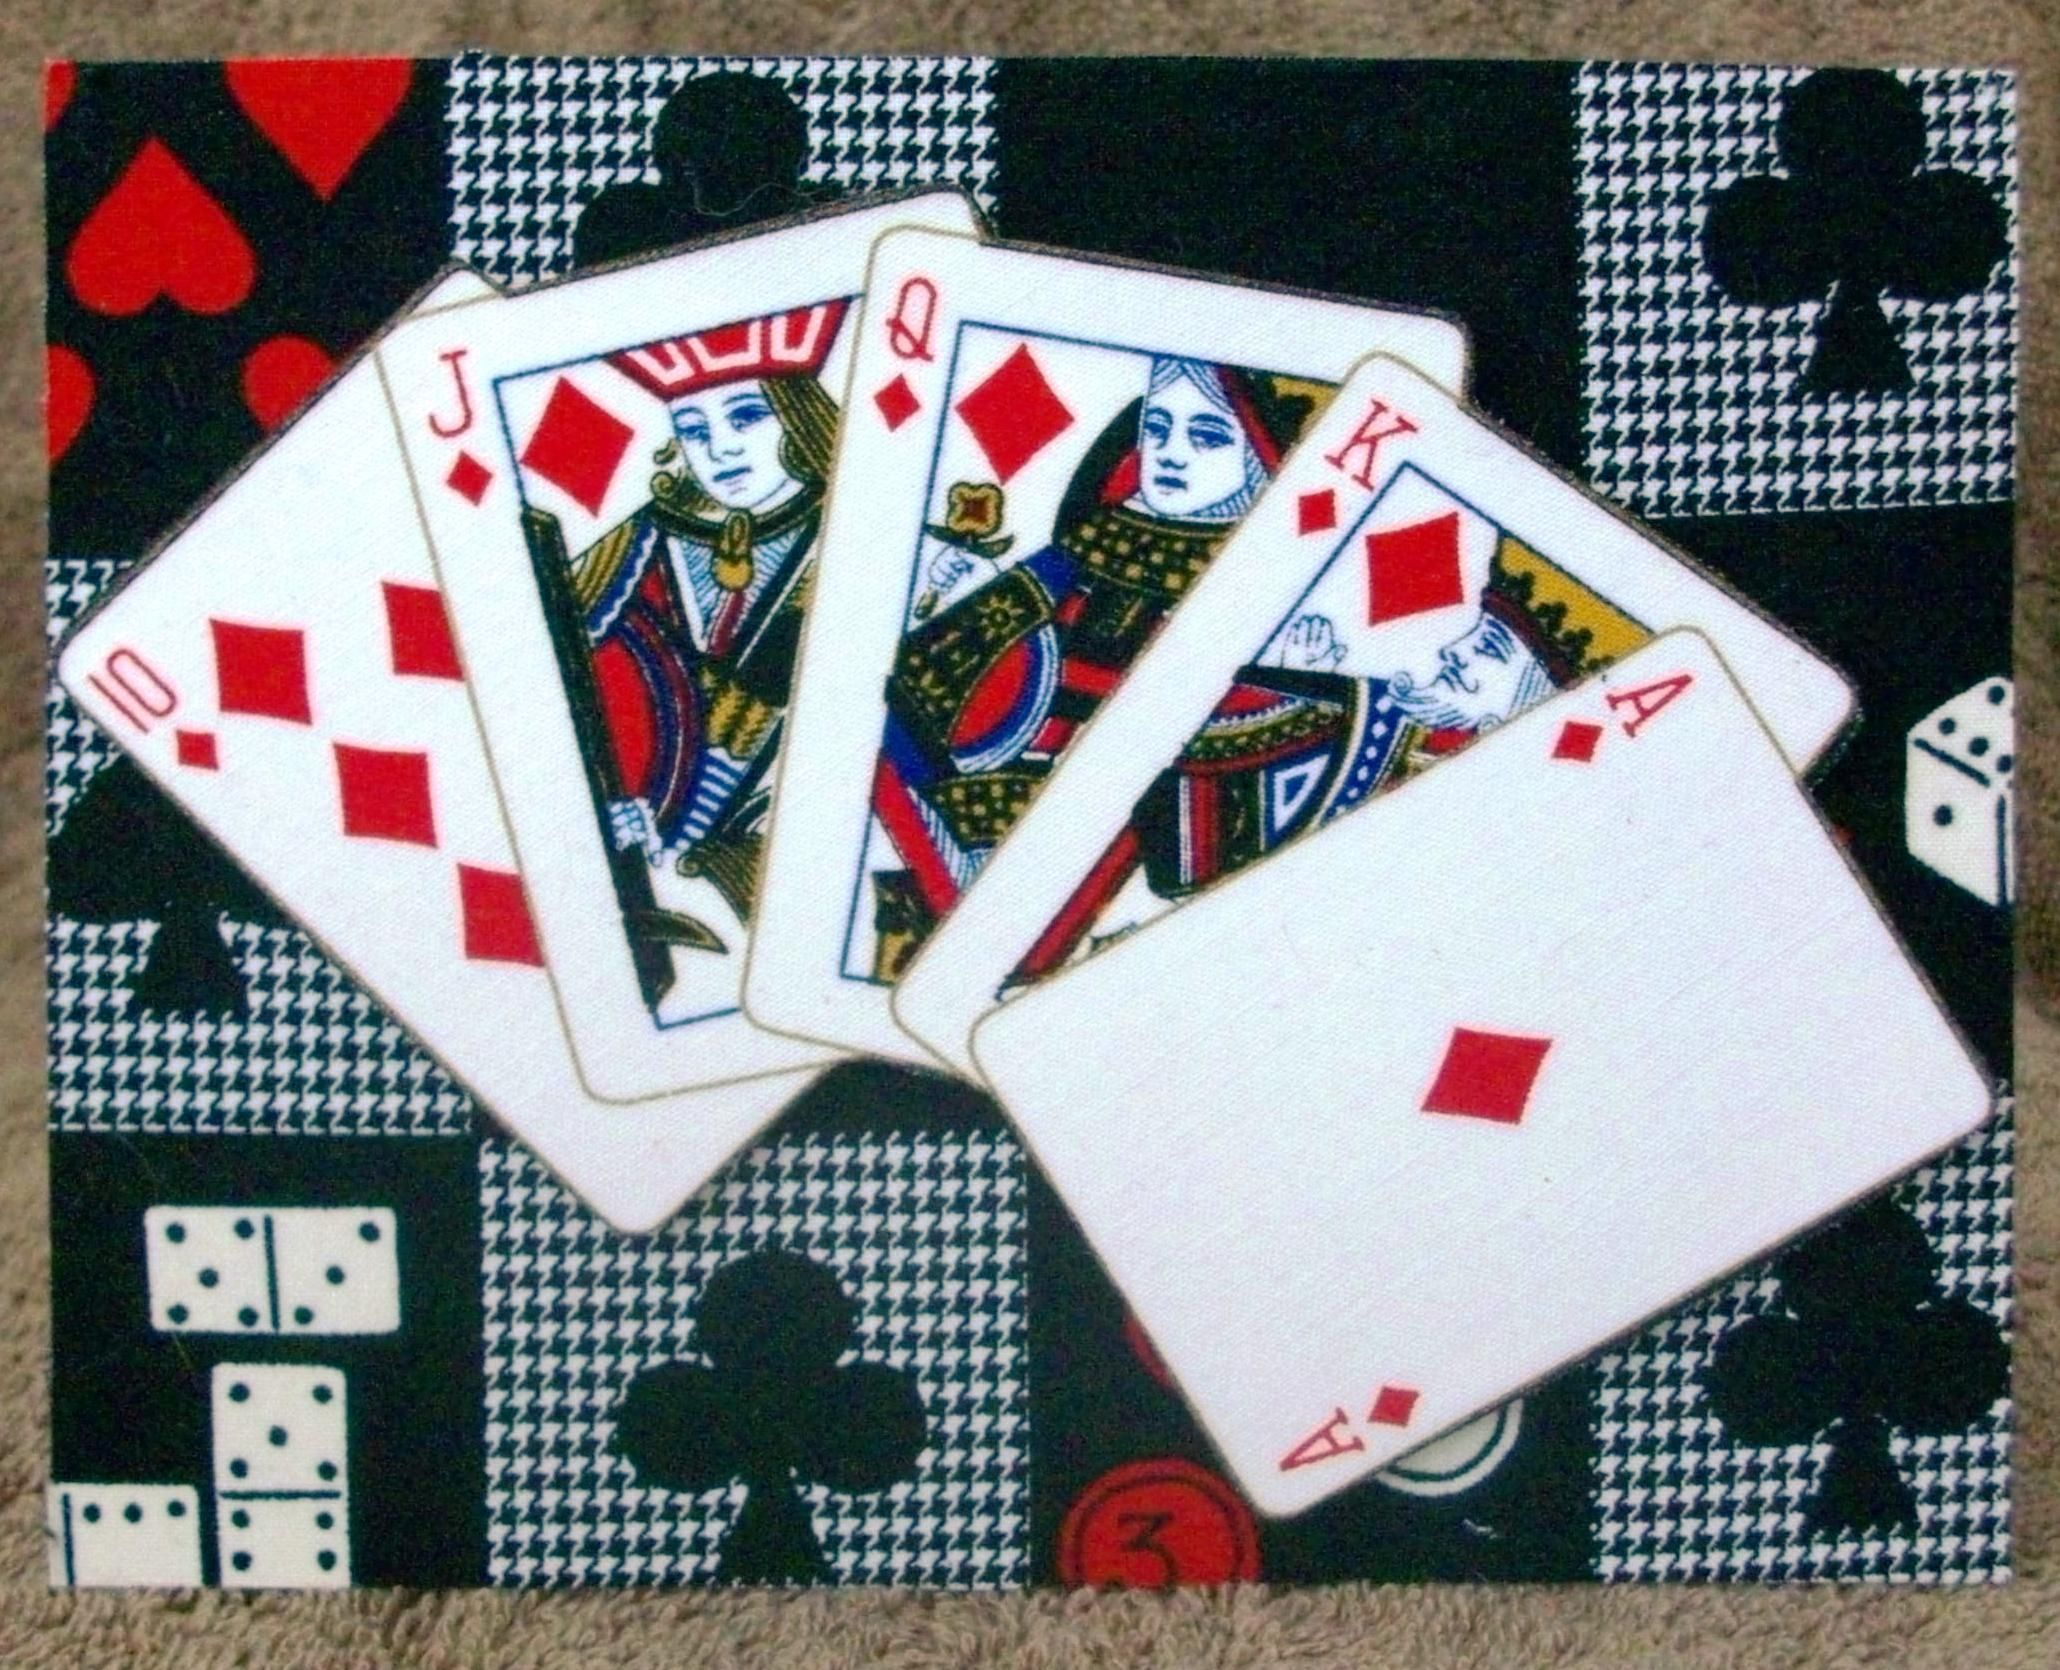 Top gambling offers barclaycard interest gambling betting